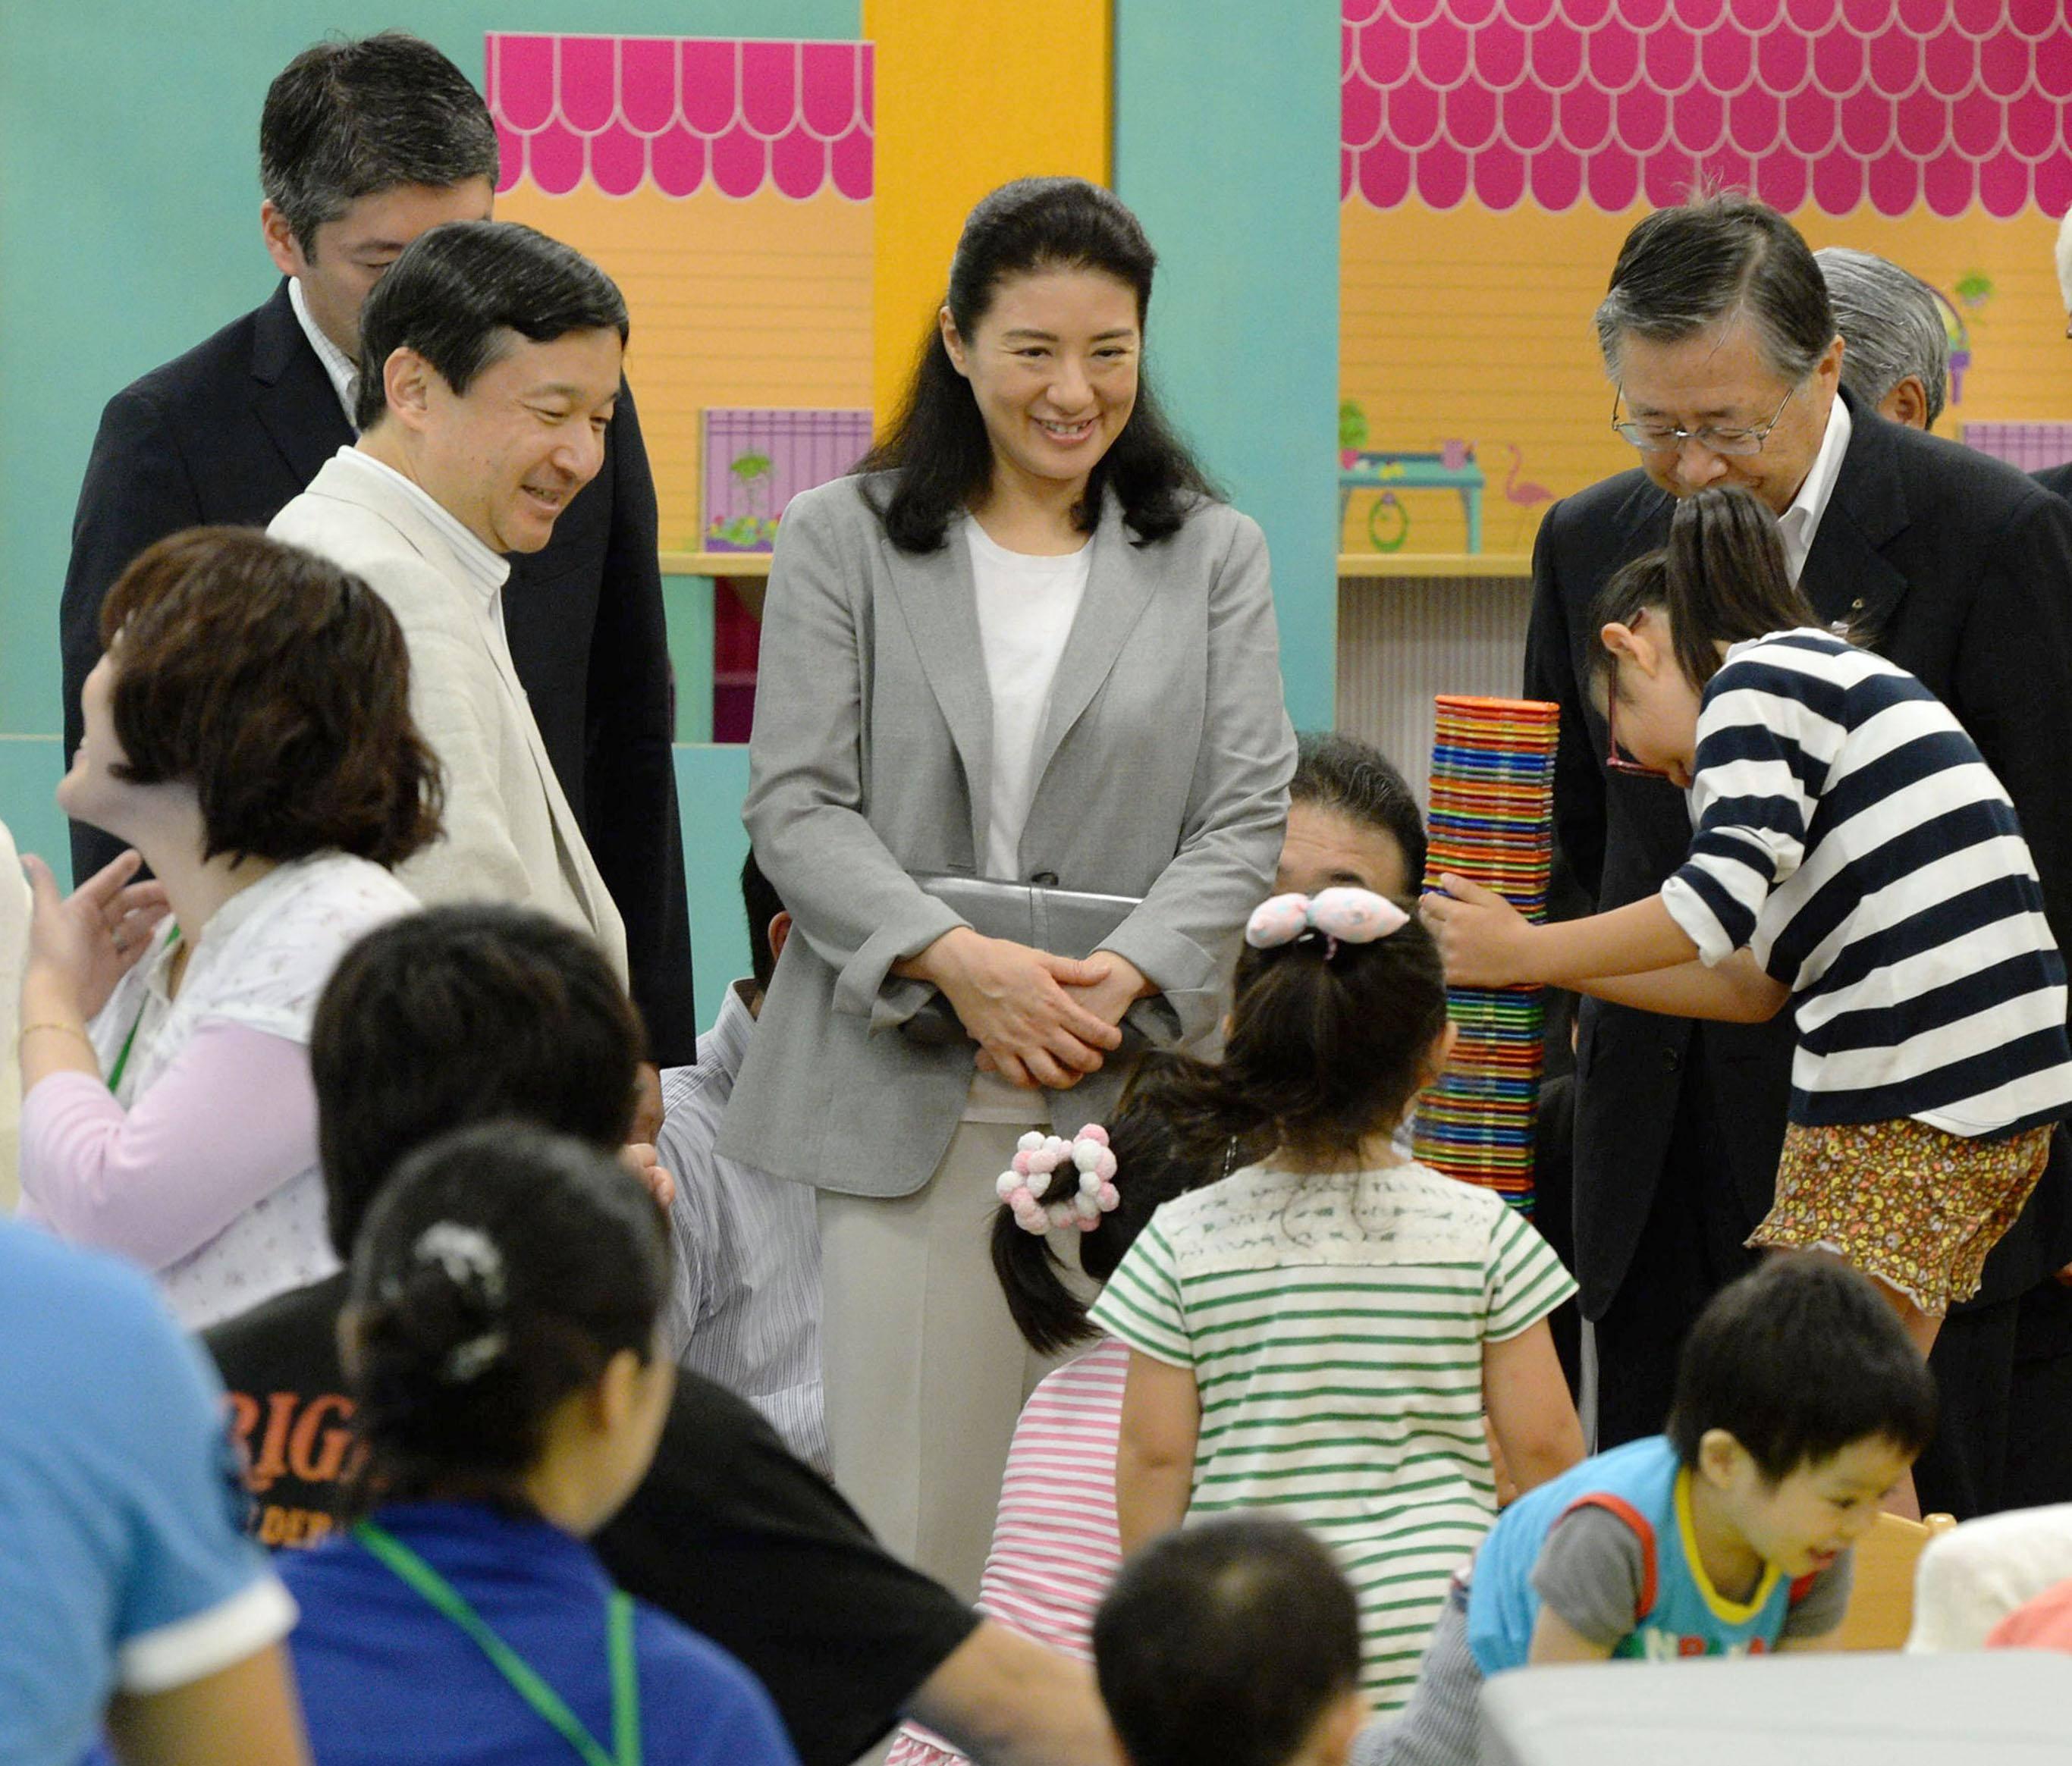 Masako, Princesa heredera del Japón. - Página 23 Nn20130923e1a-e1379858943108